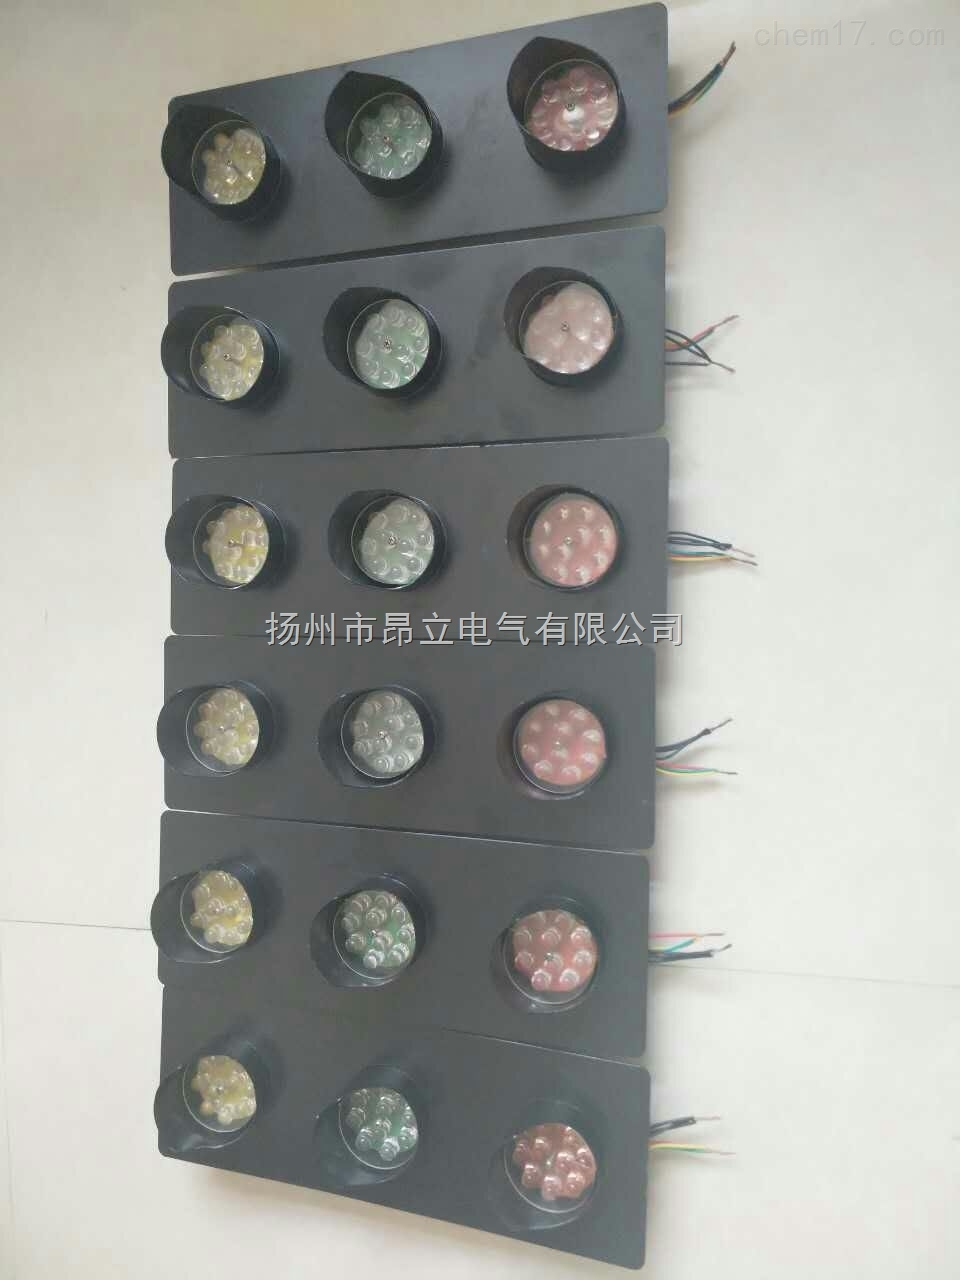 ABC-HCX-50滑触线指示灯,LED5w